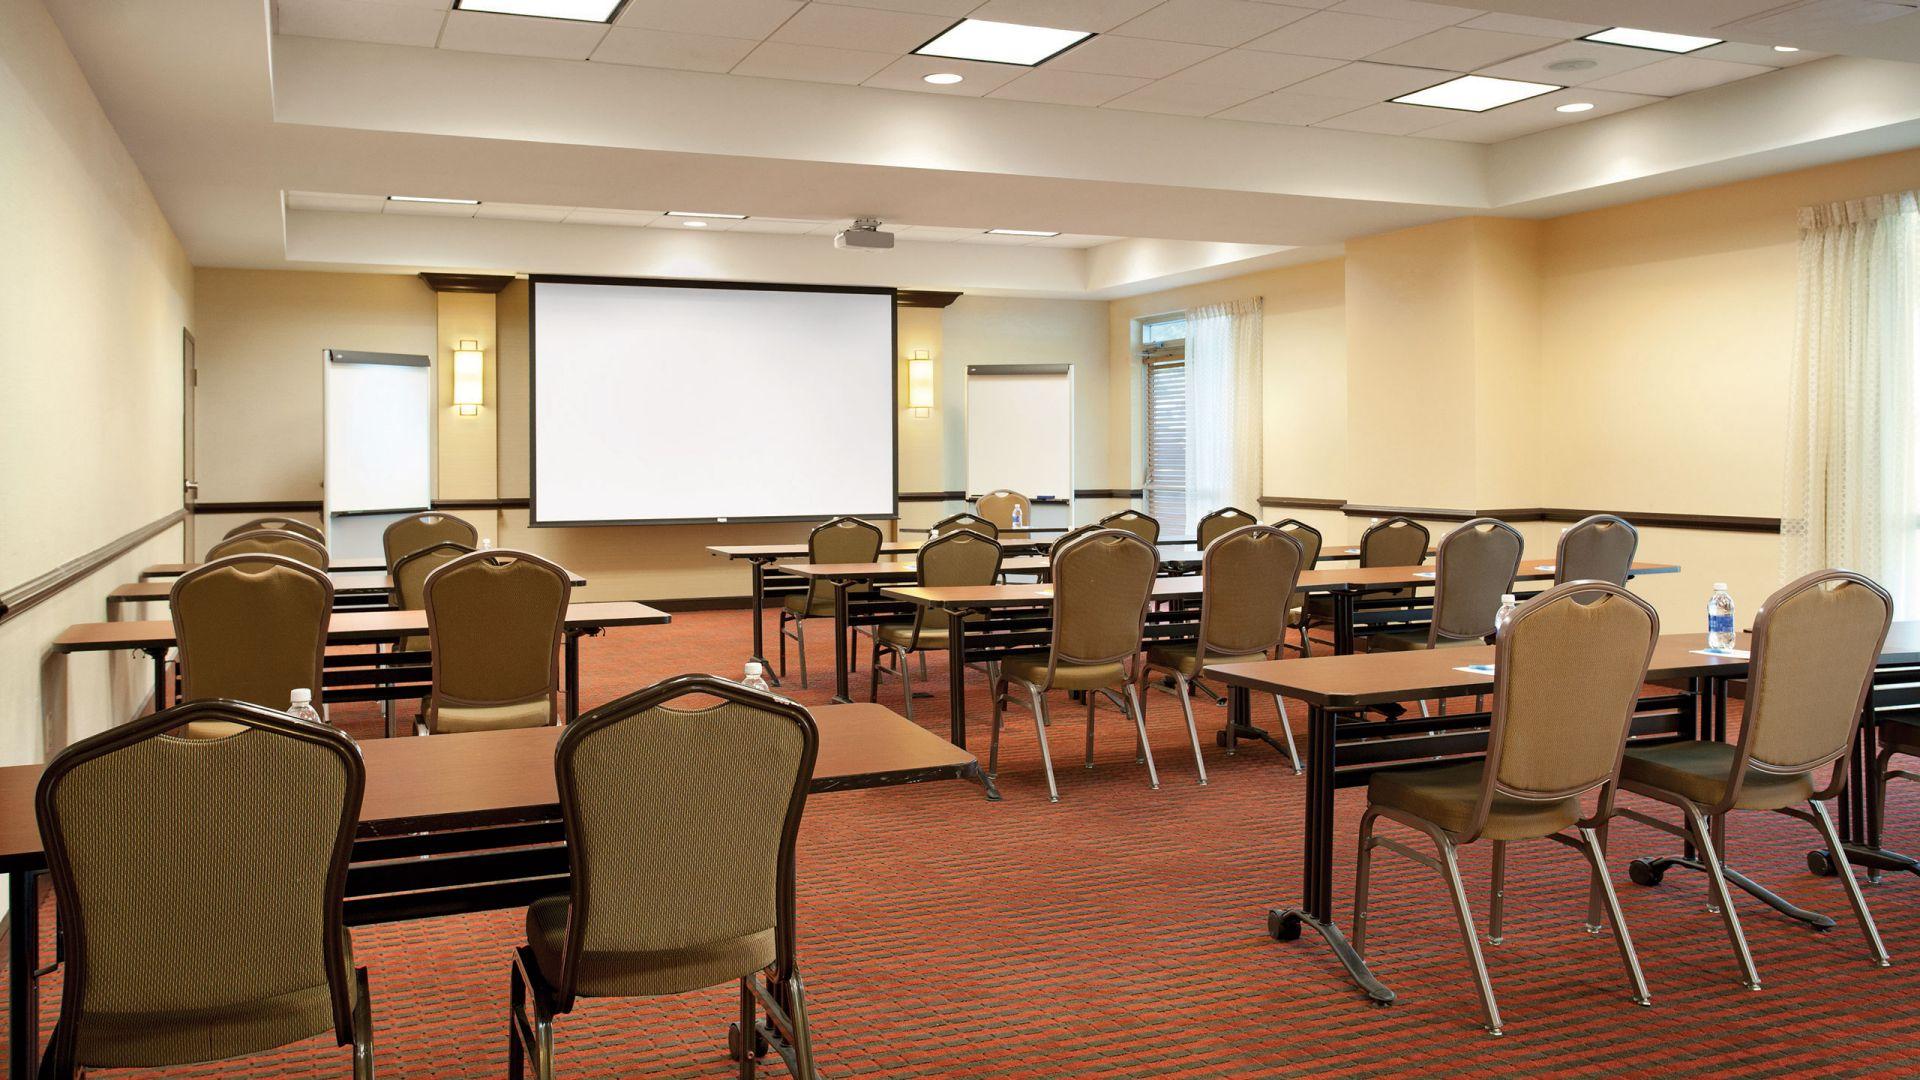 Hyatt Place Meeting Table Set-up Minneapolis Eden Prairie